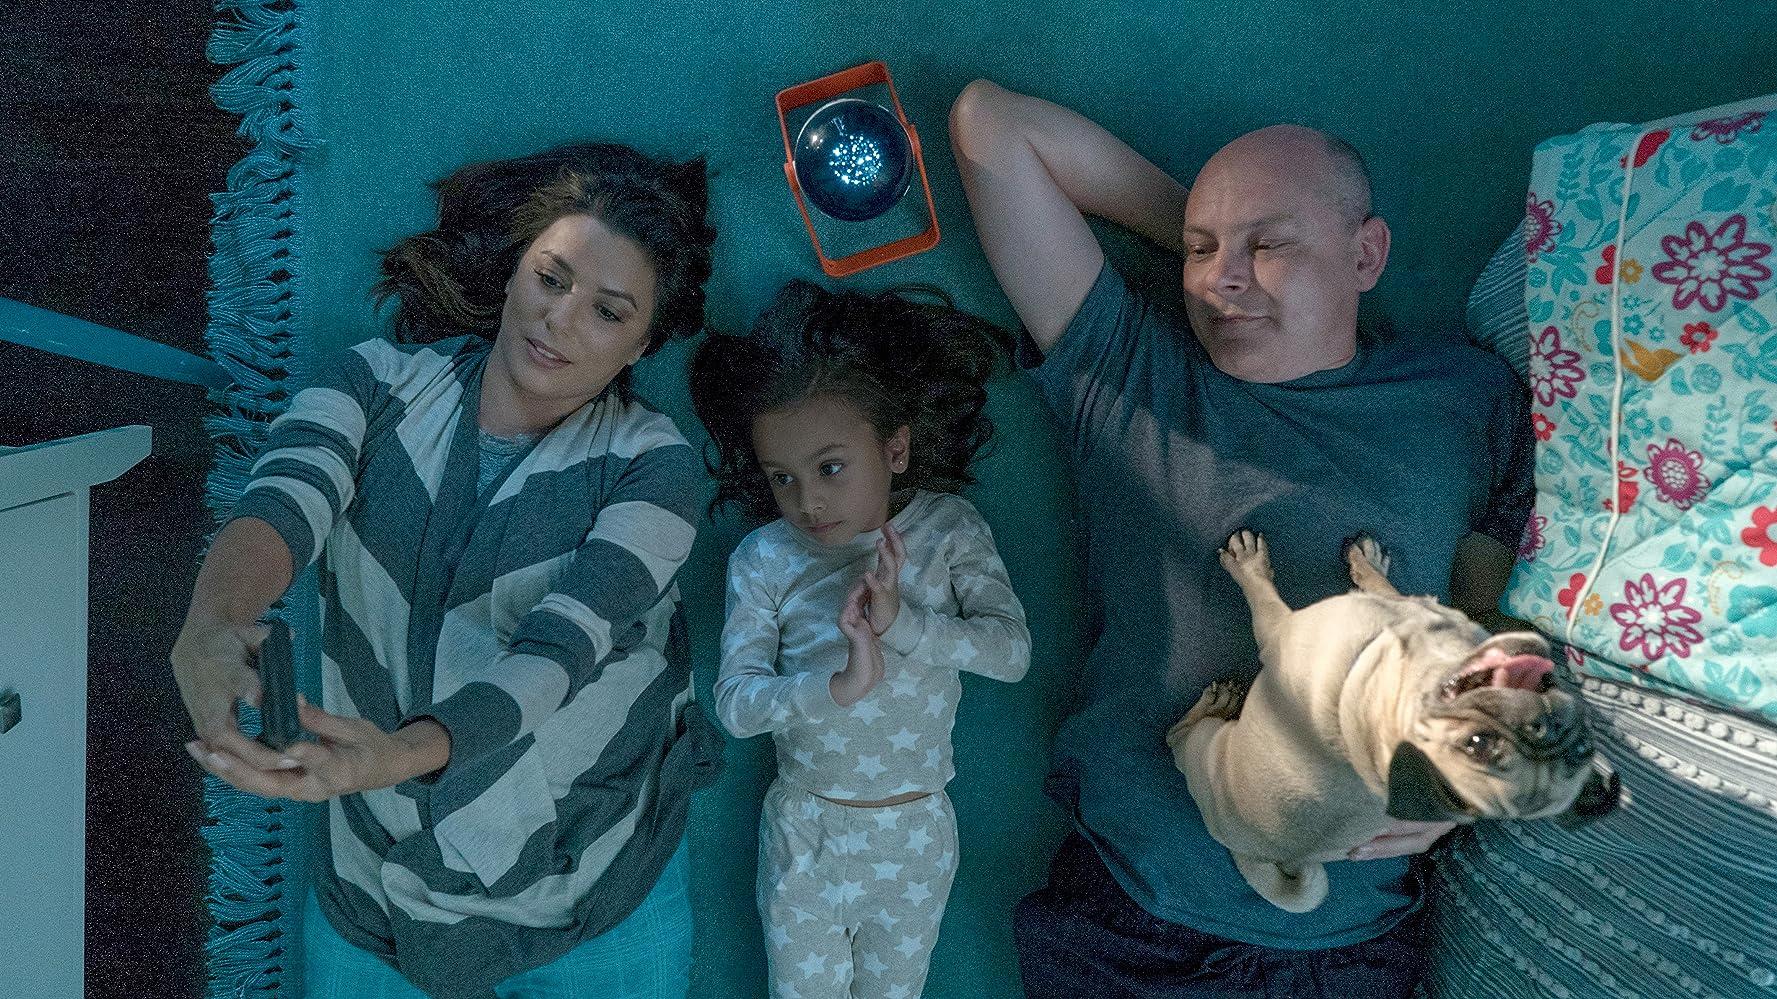 Eva Longoria, Rob Corddry, and Elizabeth Phoenix Caro in Dog Days (2018)